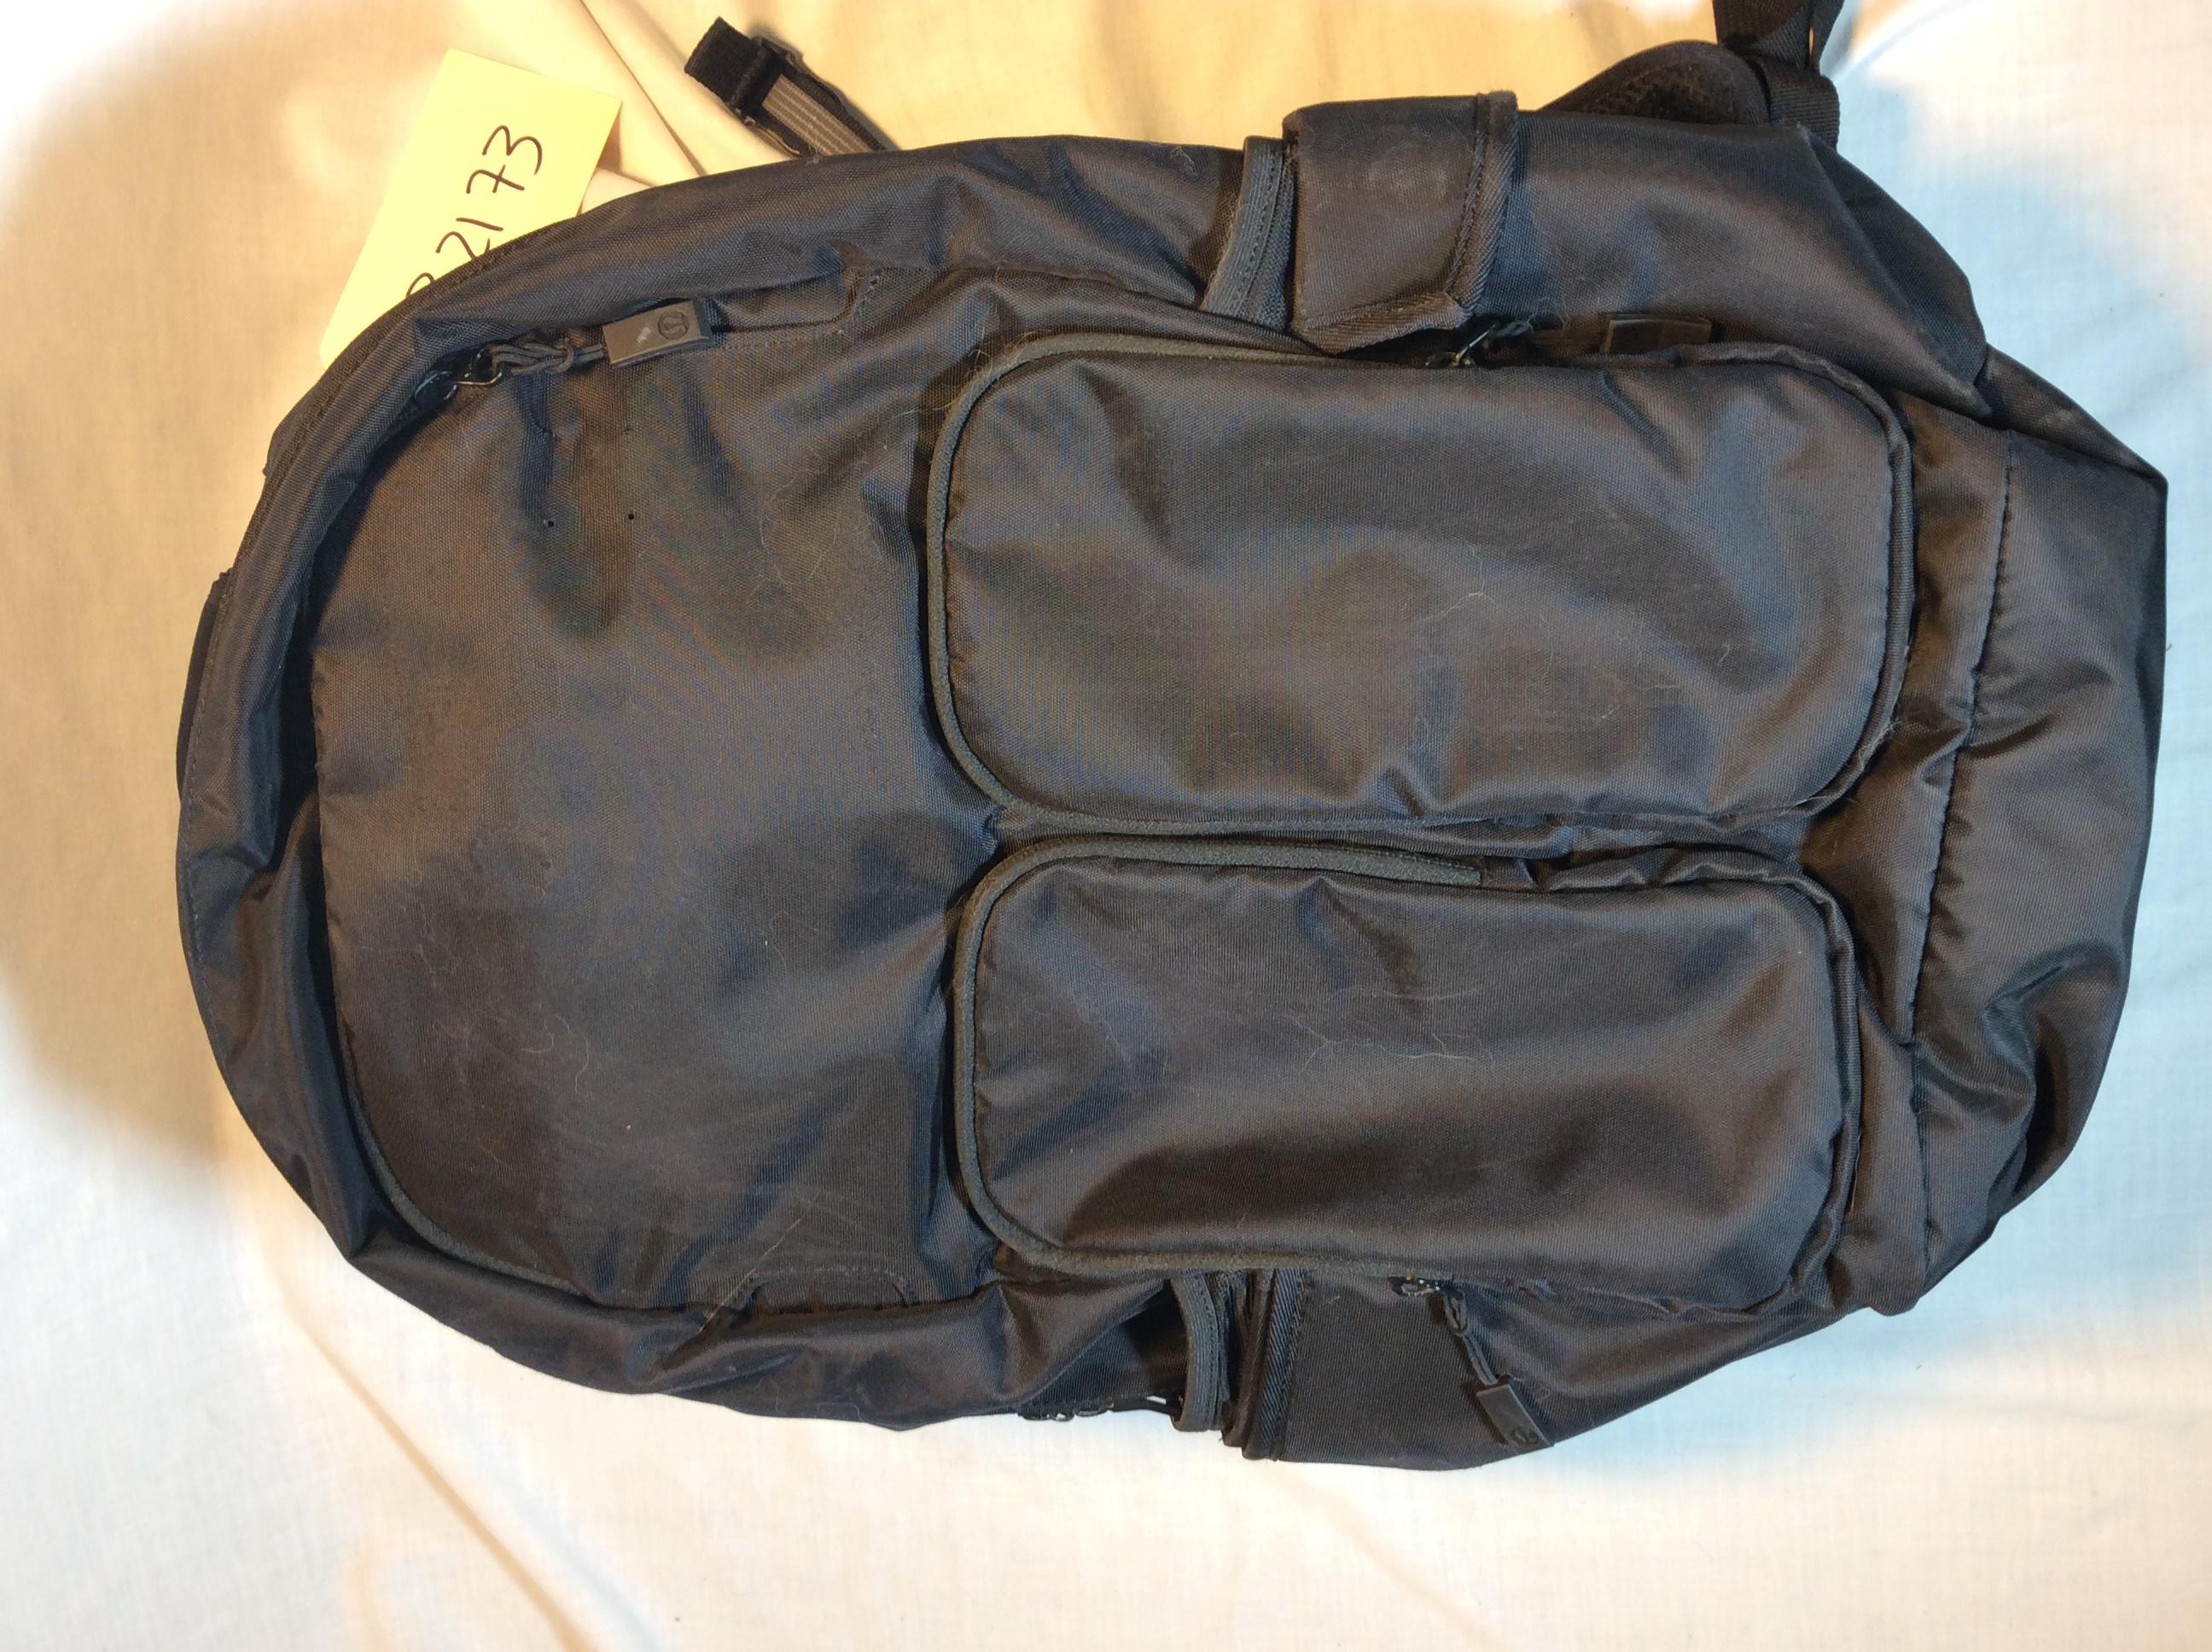 Black Lululemon Backpack